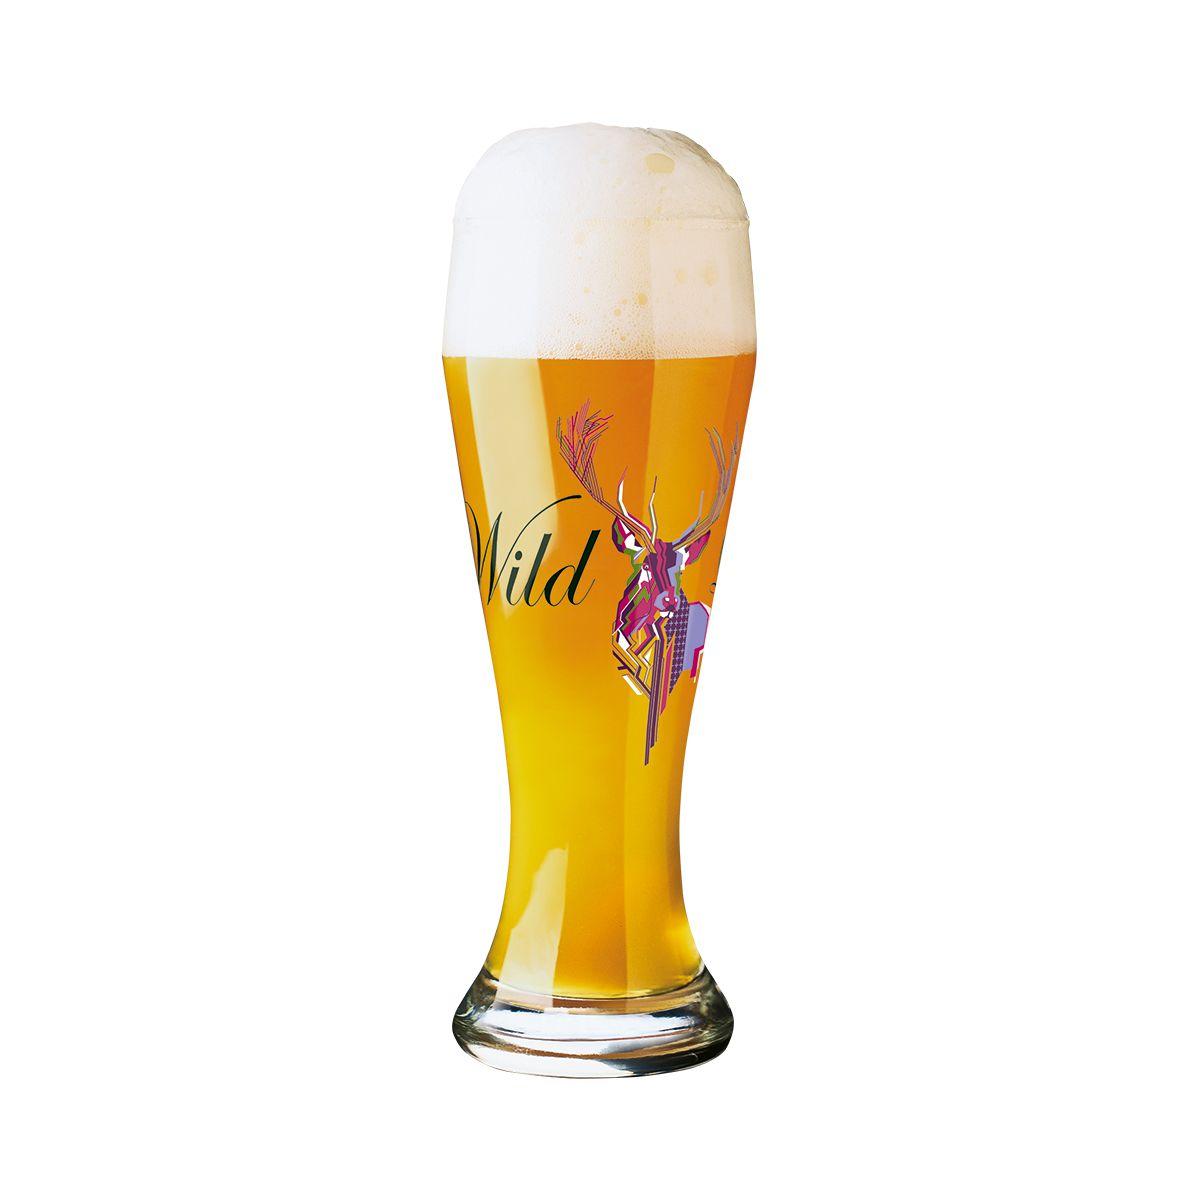 Copo de Vidro para Cerveja 500ml Wheatbeer Glass Dajana Brinkert 2012